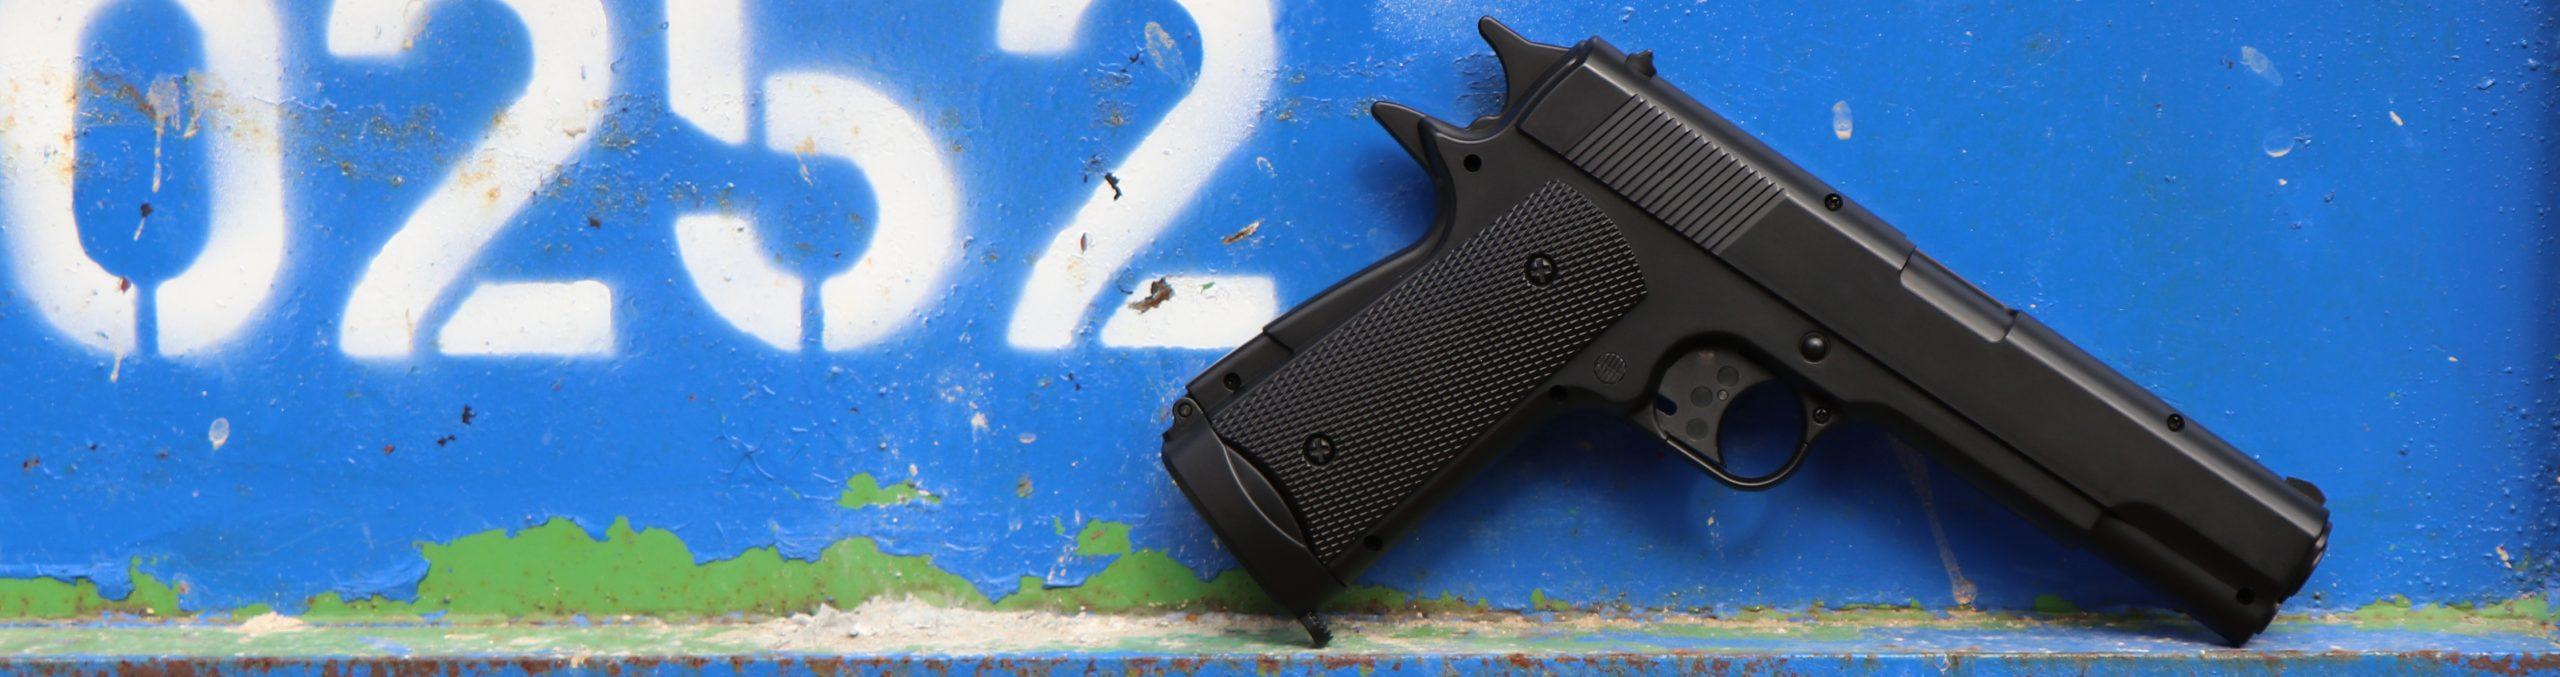 hfc airsoft pistol hgc312